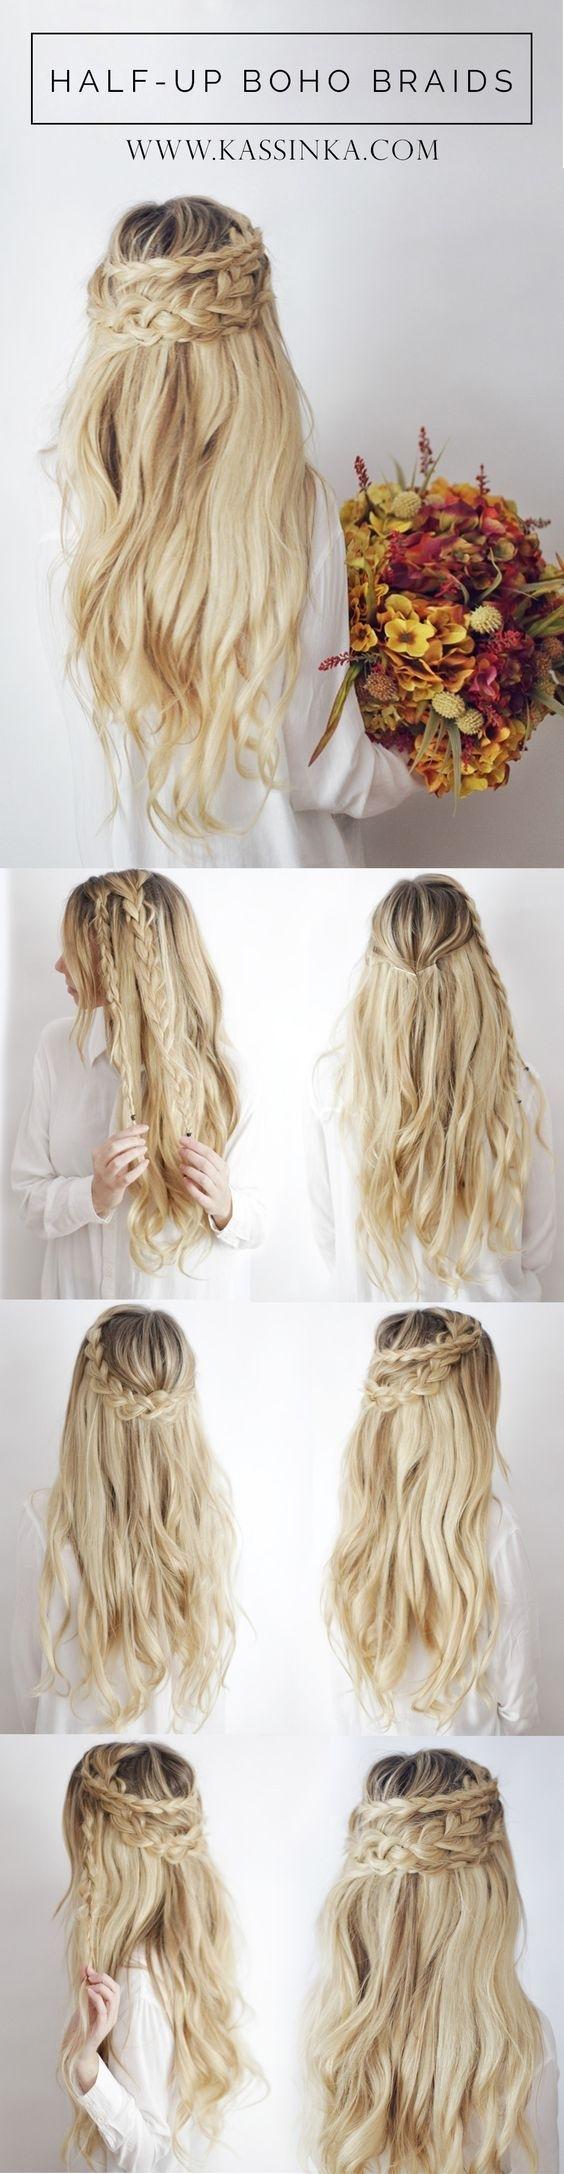 Easy Hairstyles For A Wedding | Easy Hair Styles Ideas | Pinterest ...